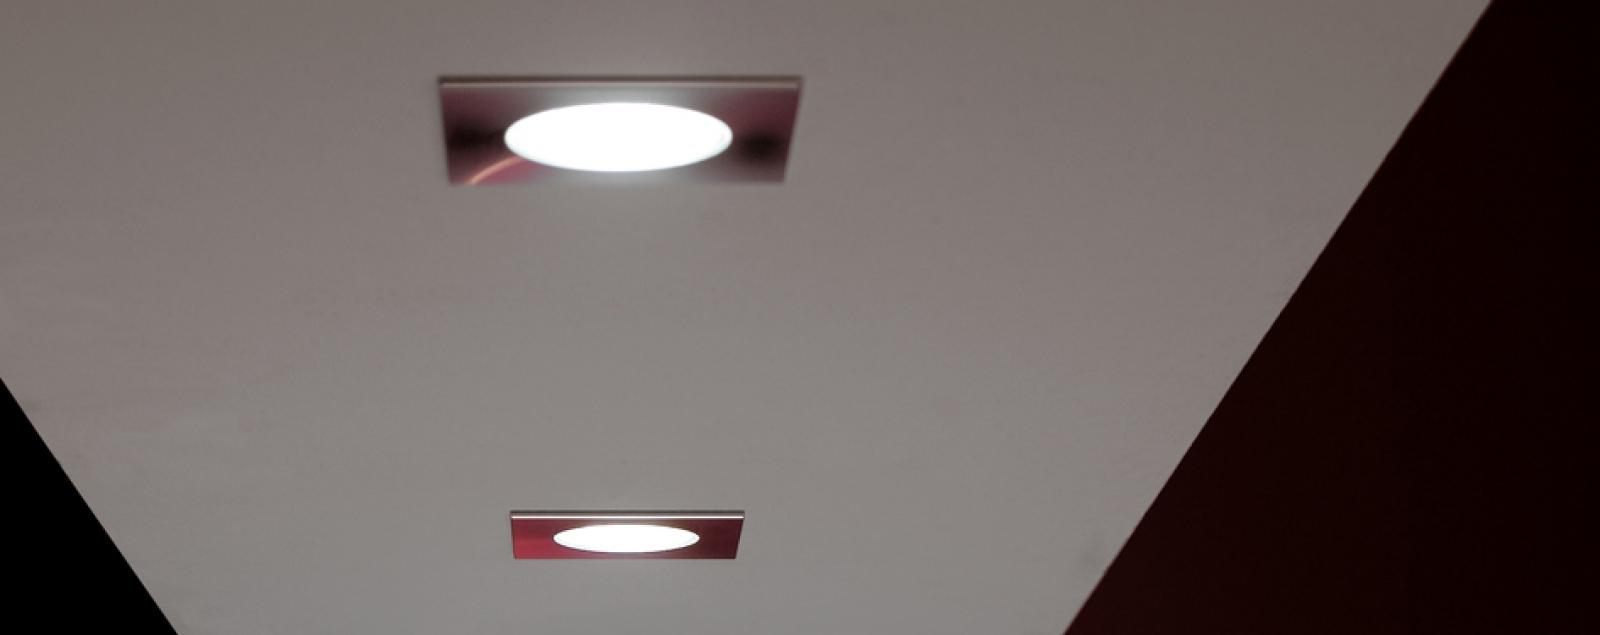 D60 Cricket recessed lighting - Fabbian Illuminazione